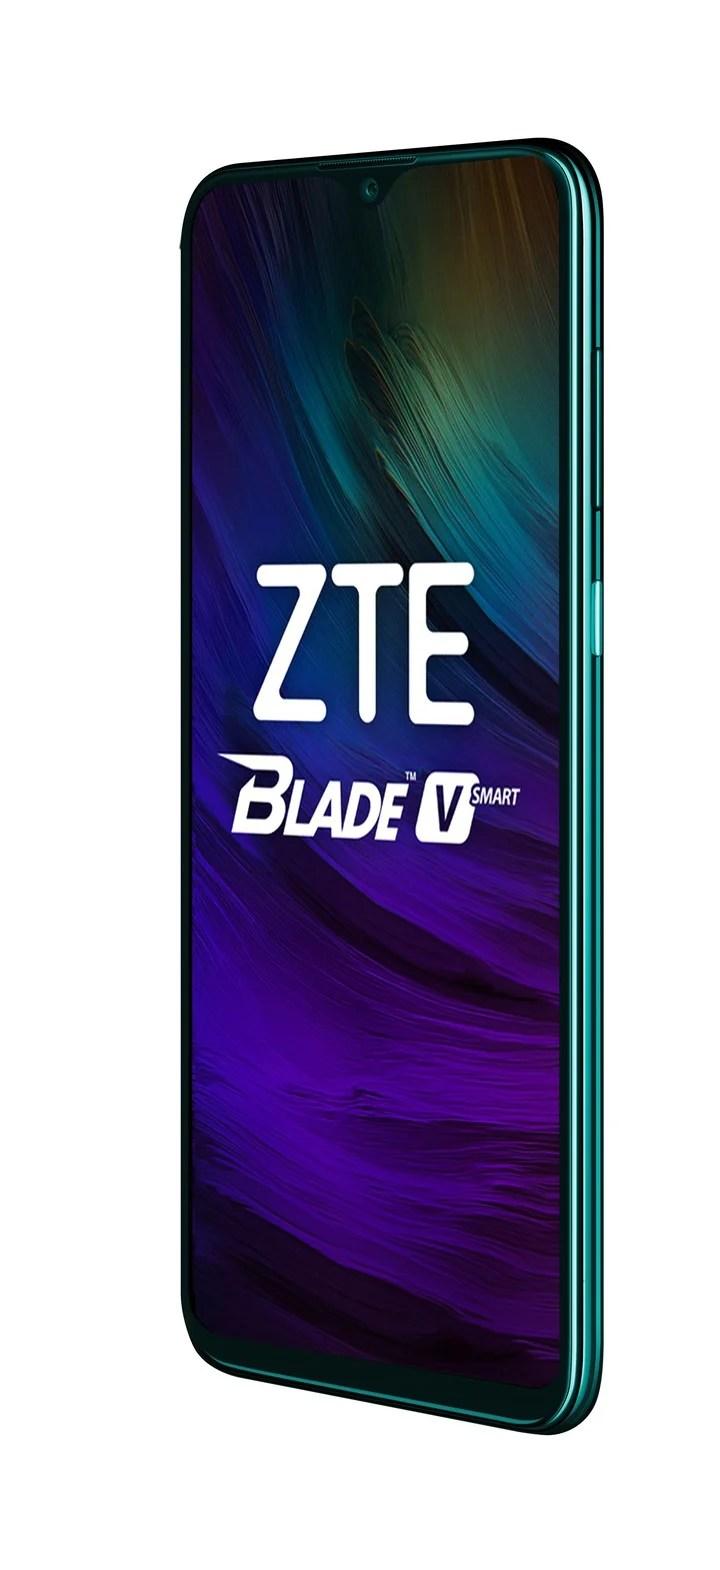 "ZTE Blade V Smart.  6.49 ""HD + Full Display screen, Mediatek Helio P60 Octa-Core 2.0GHz chip, 16MP, 8MP and 2MP triple camera.  5000 mAh battery.  Price: $ 28,999."